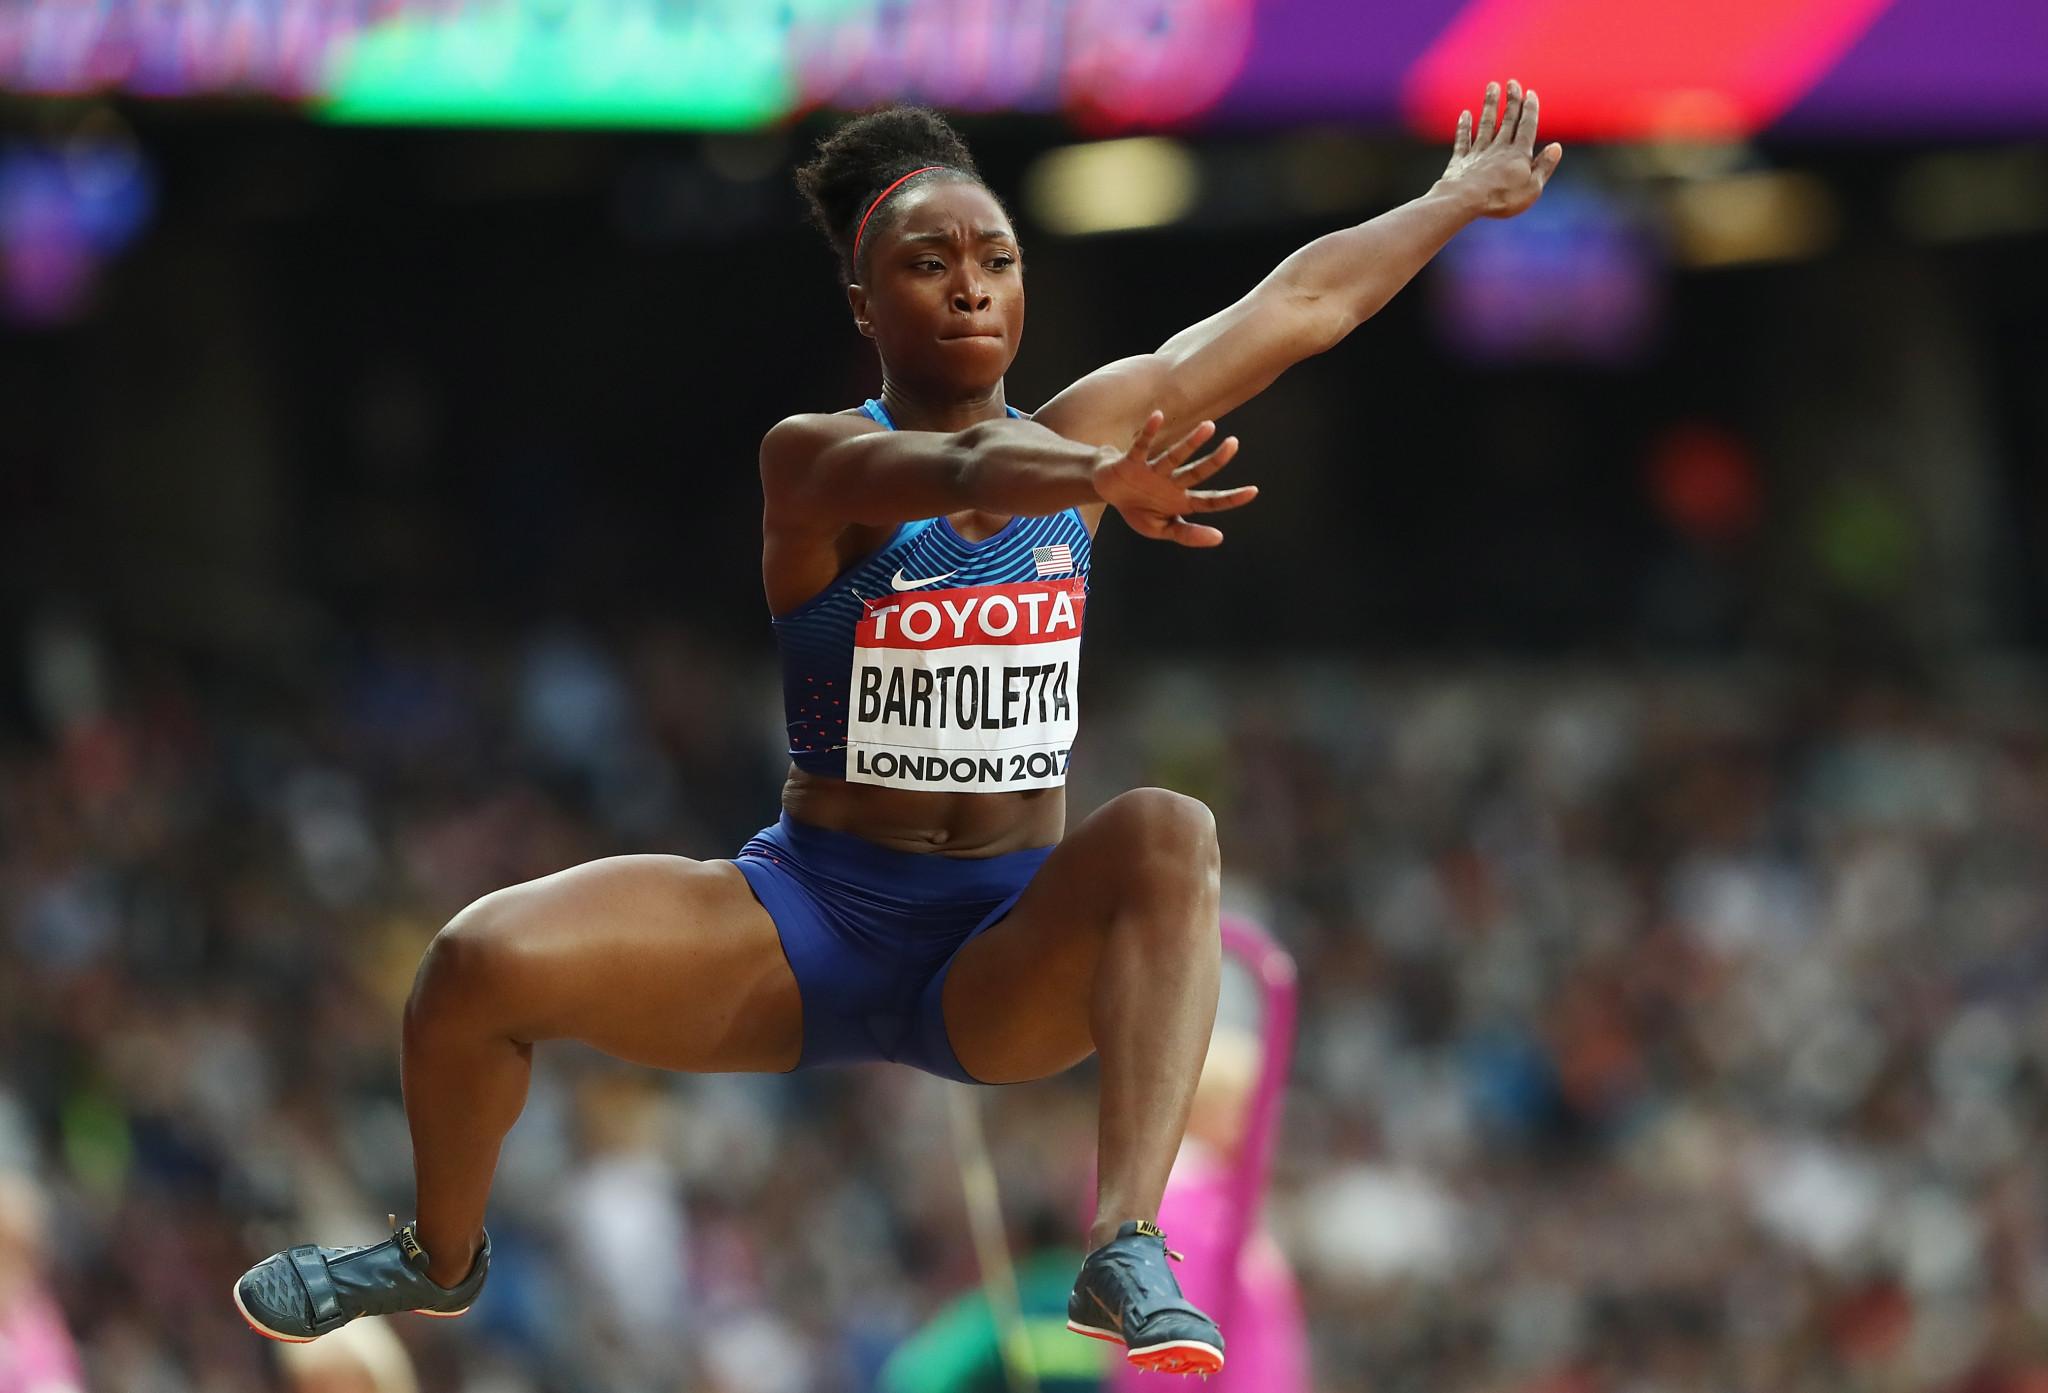 Olympic champion Bartoletta slams Coleman over attitude towards whereabouts failures